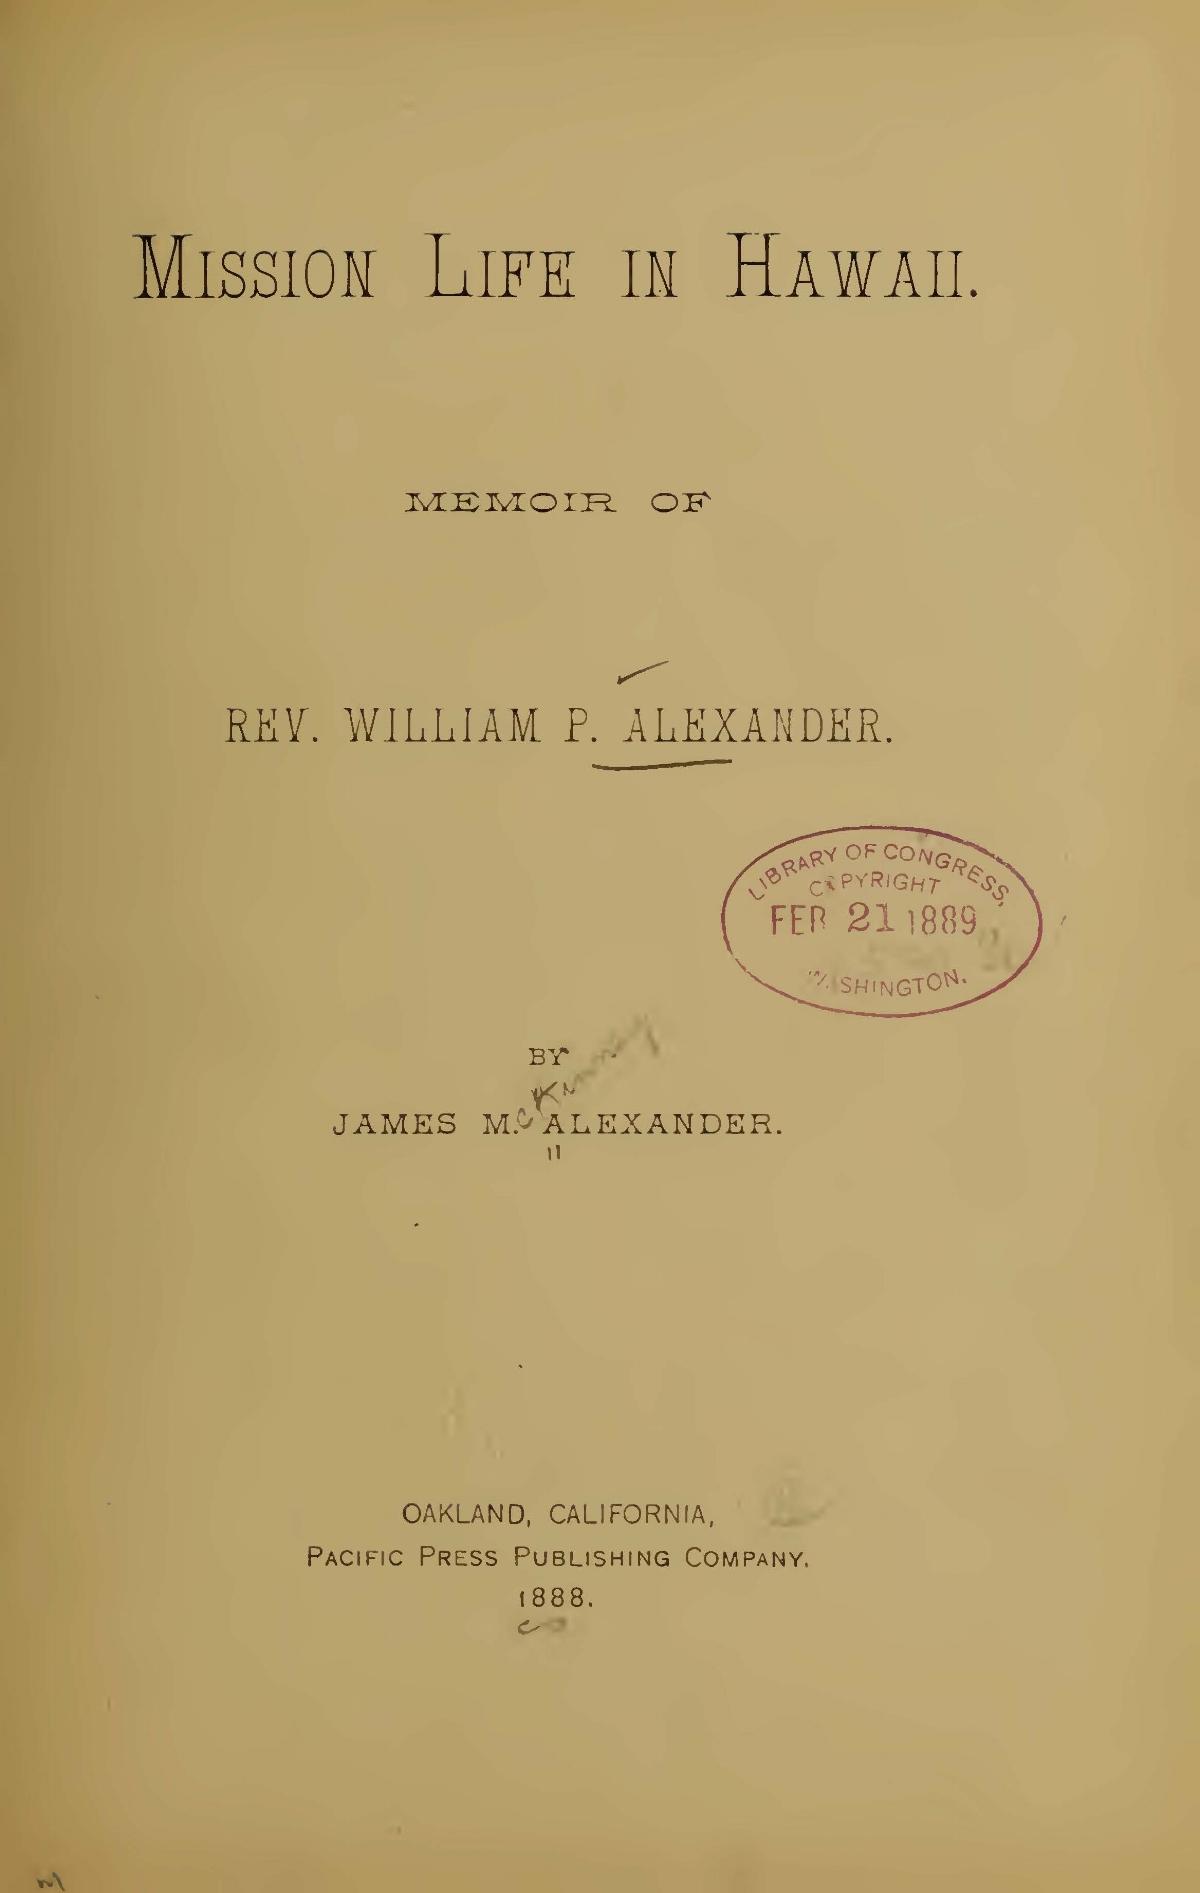 Alexander, James McKinney, Mission Life in Hawaii Memoir of Rev. William P. Alexander Title Page.jpg